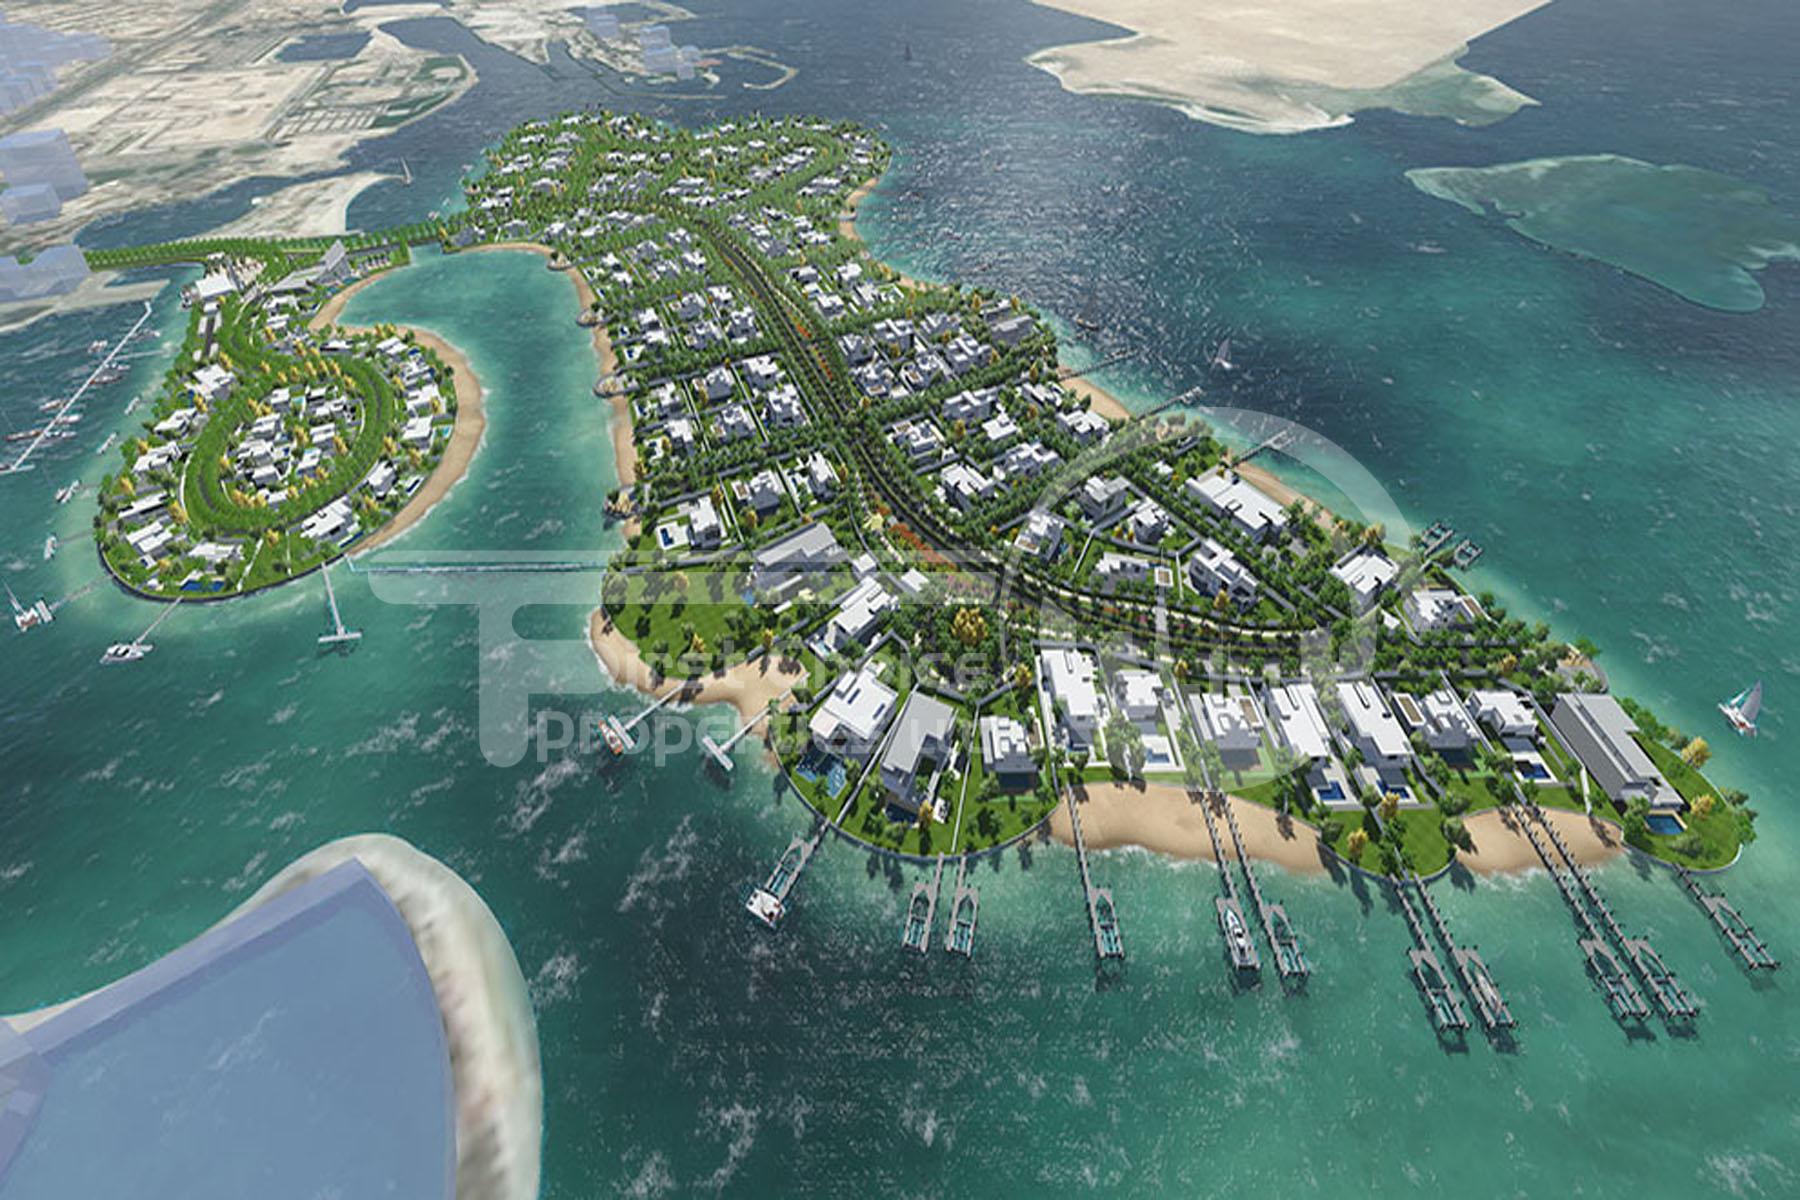 Residential Island - Nareel Island - Al Bateen - Abu Dhabi - UAE (14).jpg